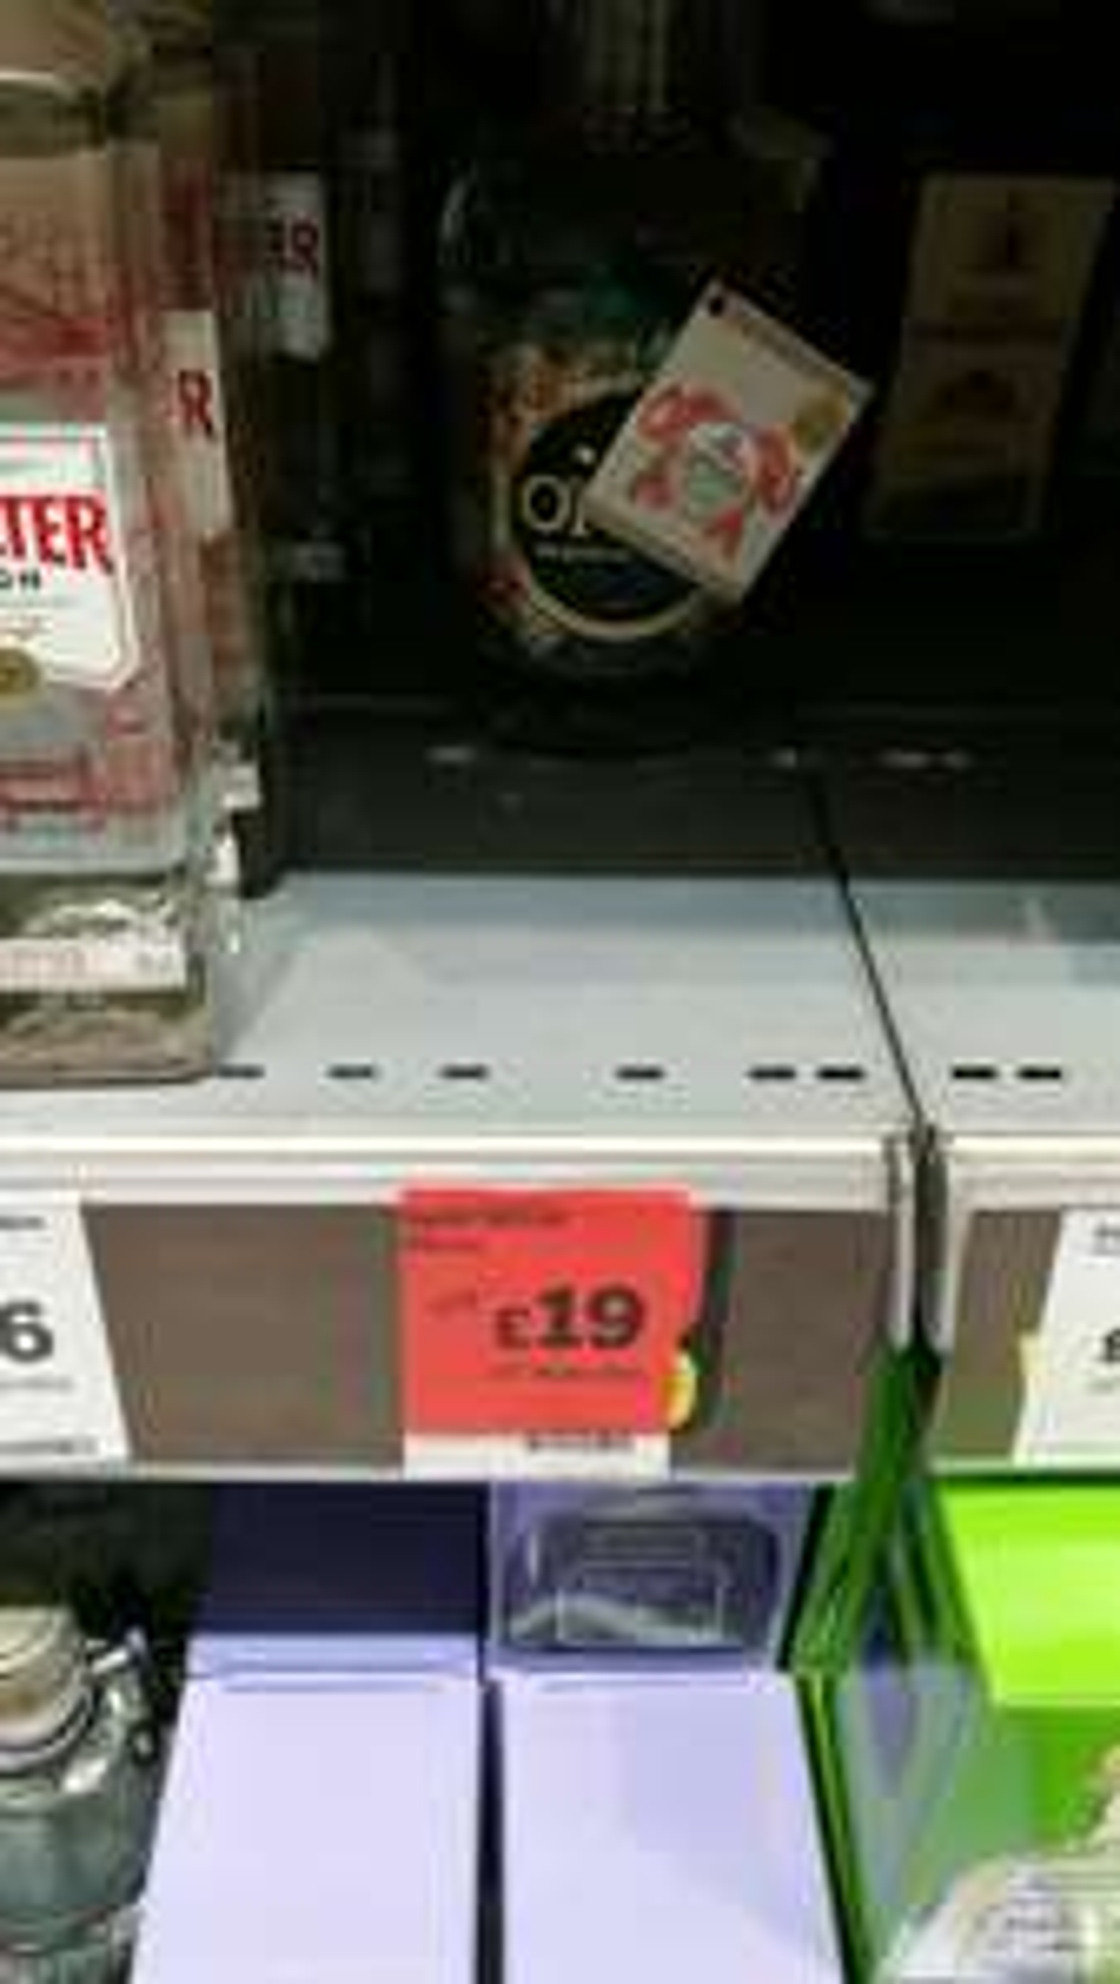 Opihr Gin 70cl £19 Sainsbury's (instore)